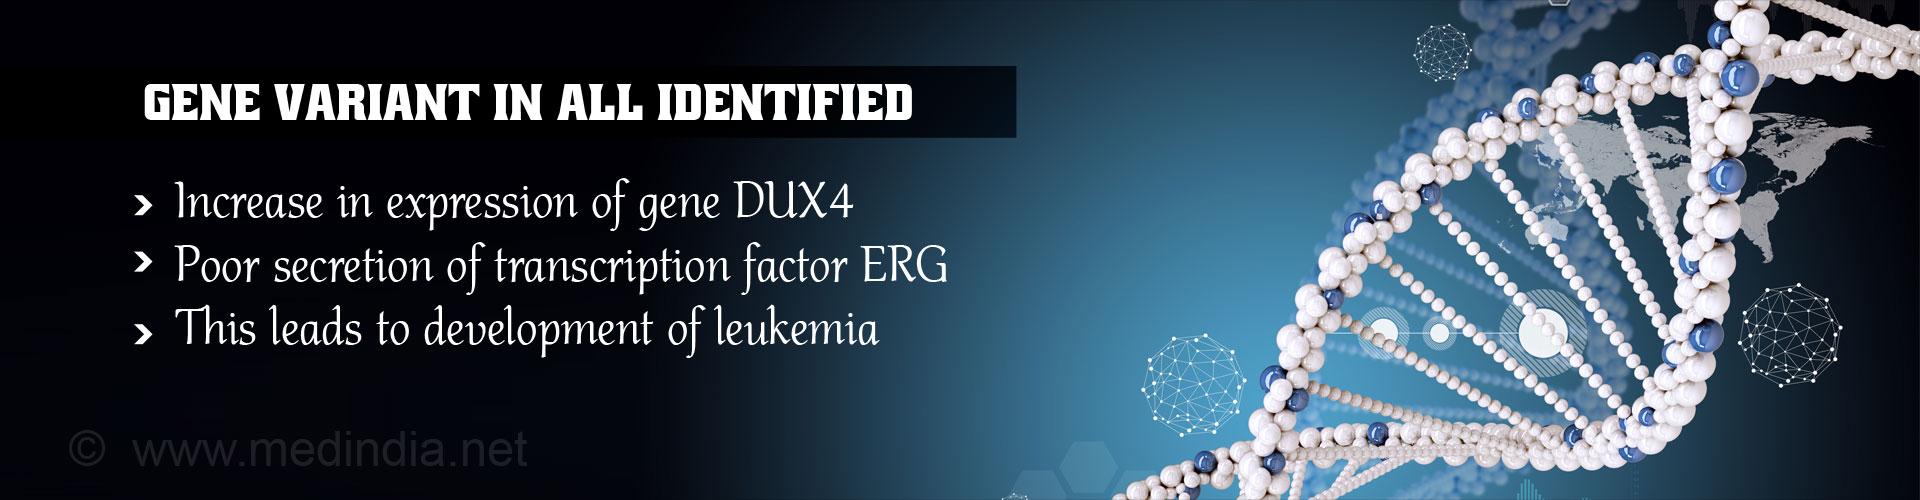 Genetic Changes Linked to Acute Lymphoblastic Leukemia